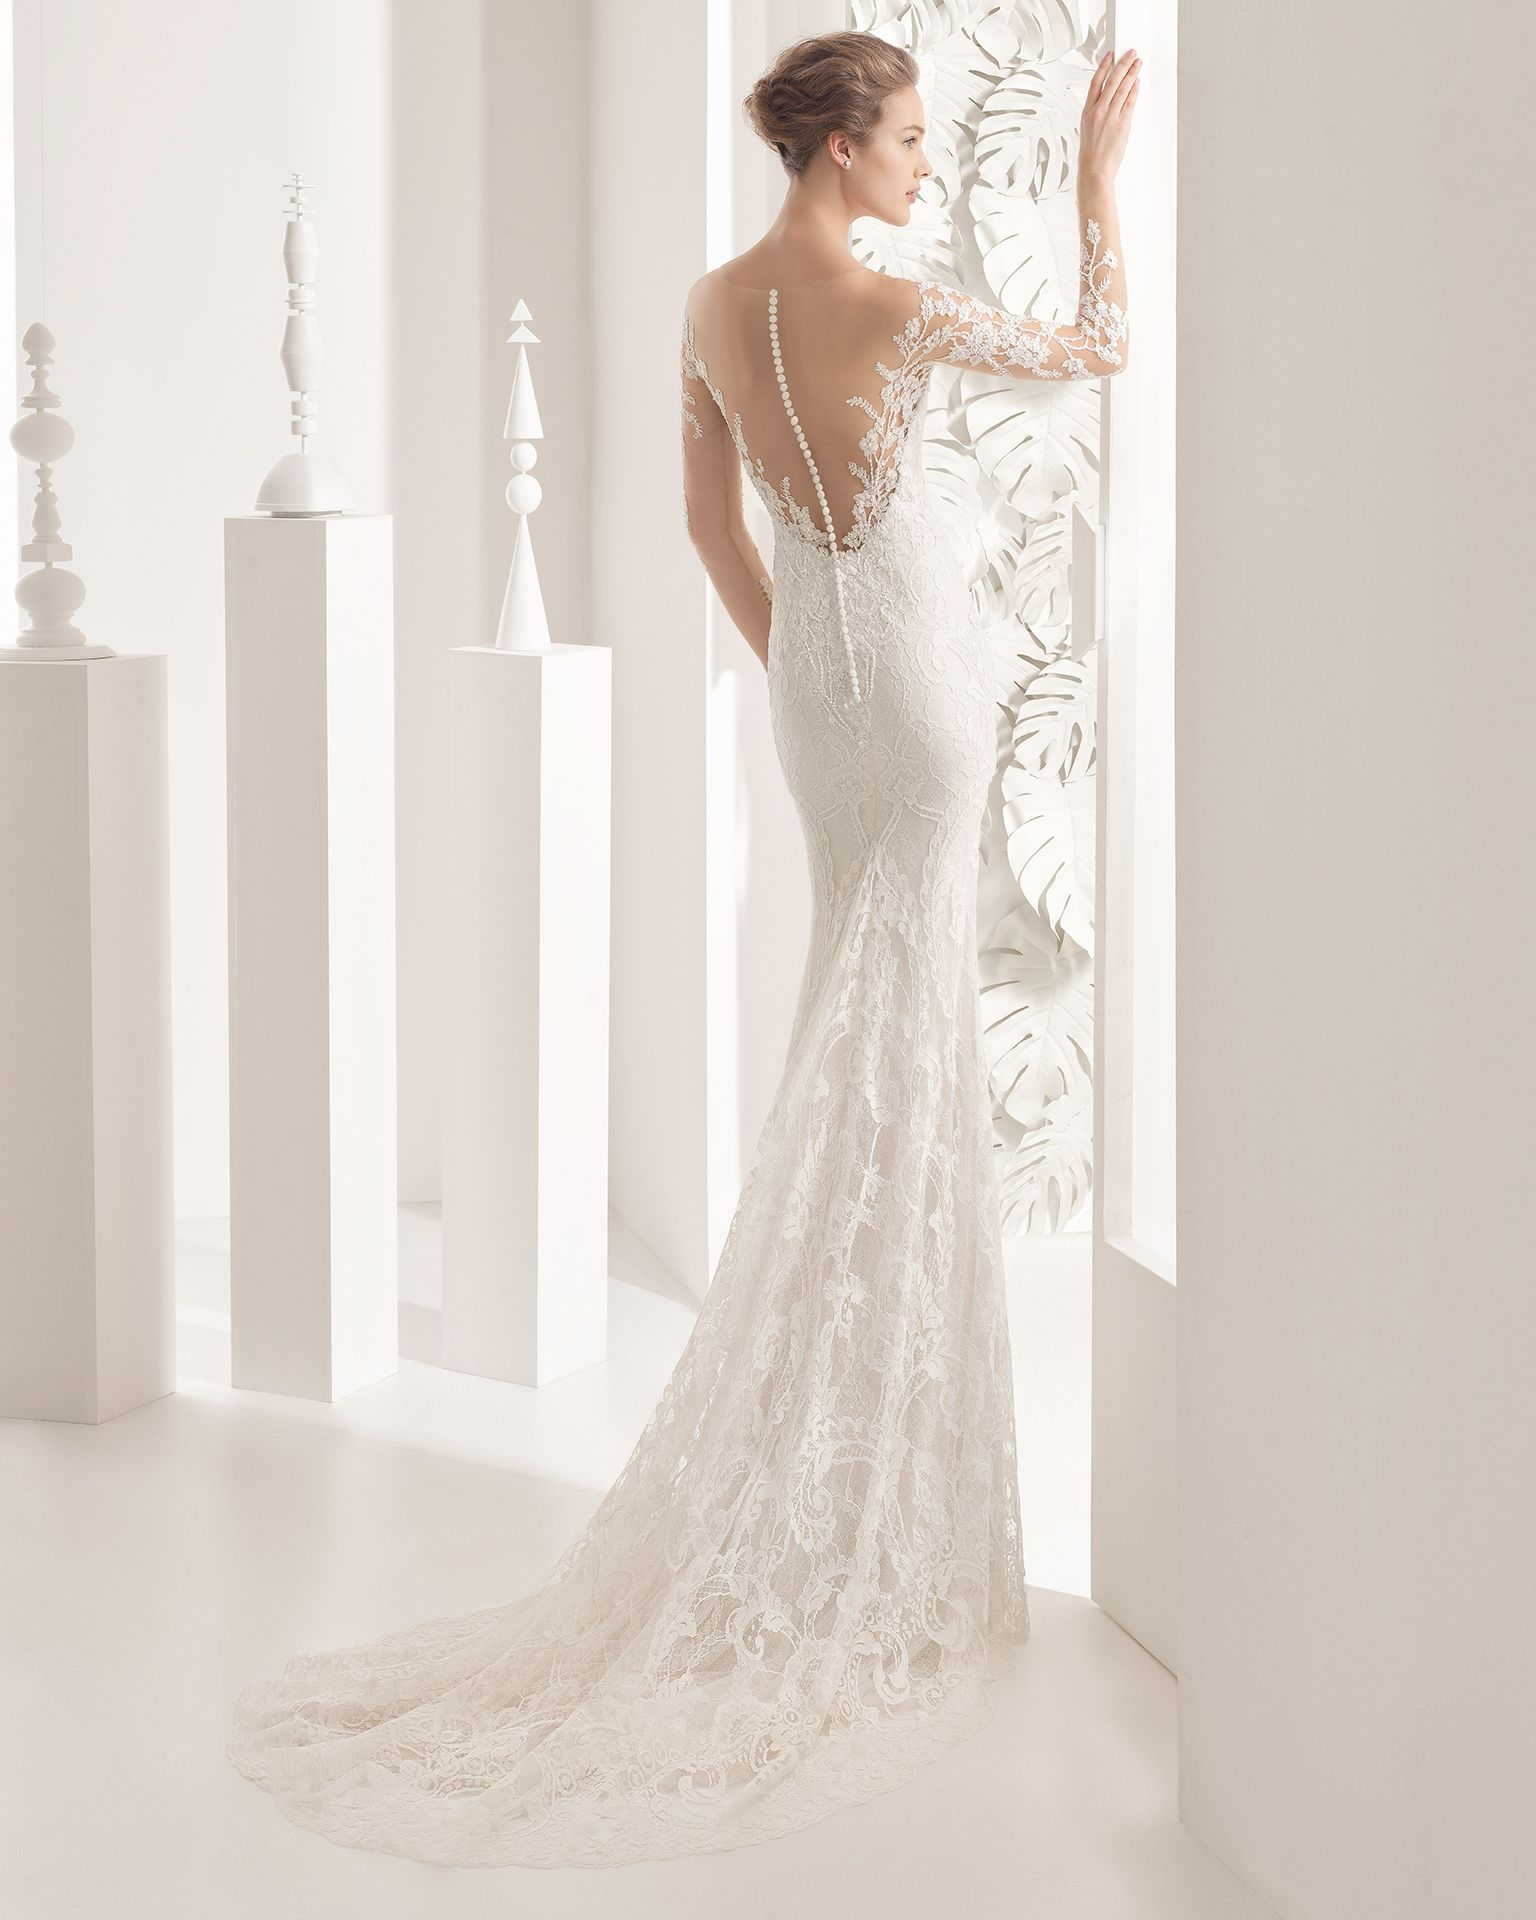 Naim - 2017 Bridal Collection. Rosa Clará. | Brautkleid ...